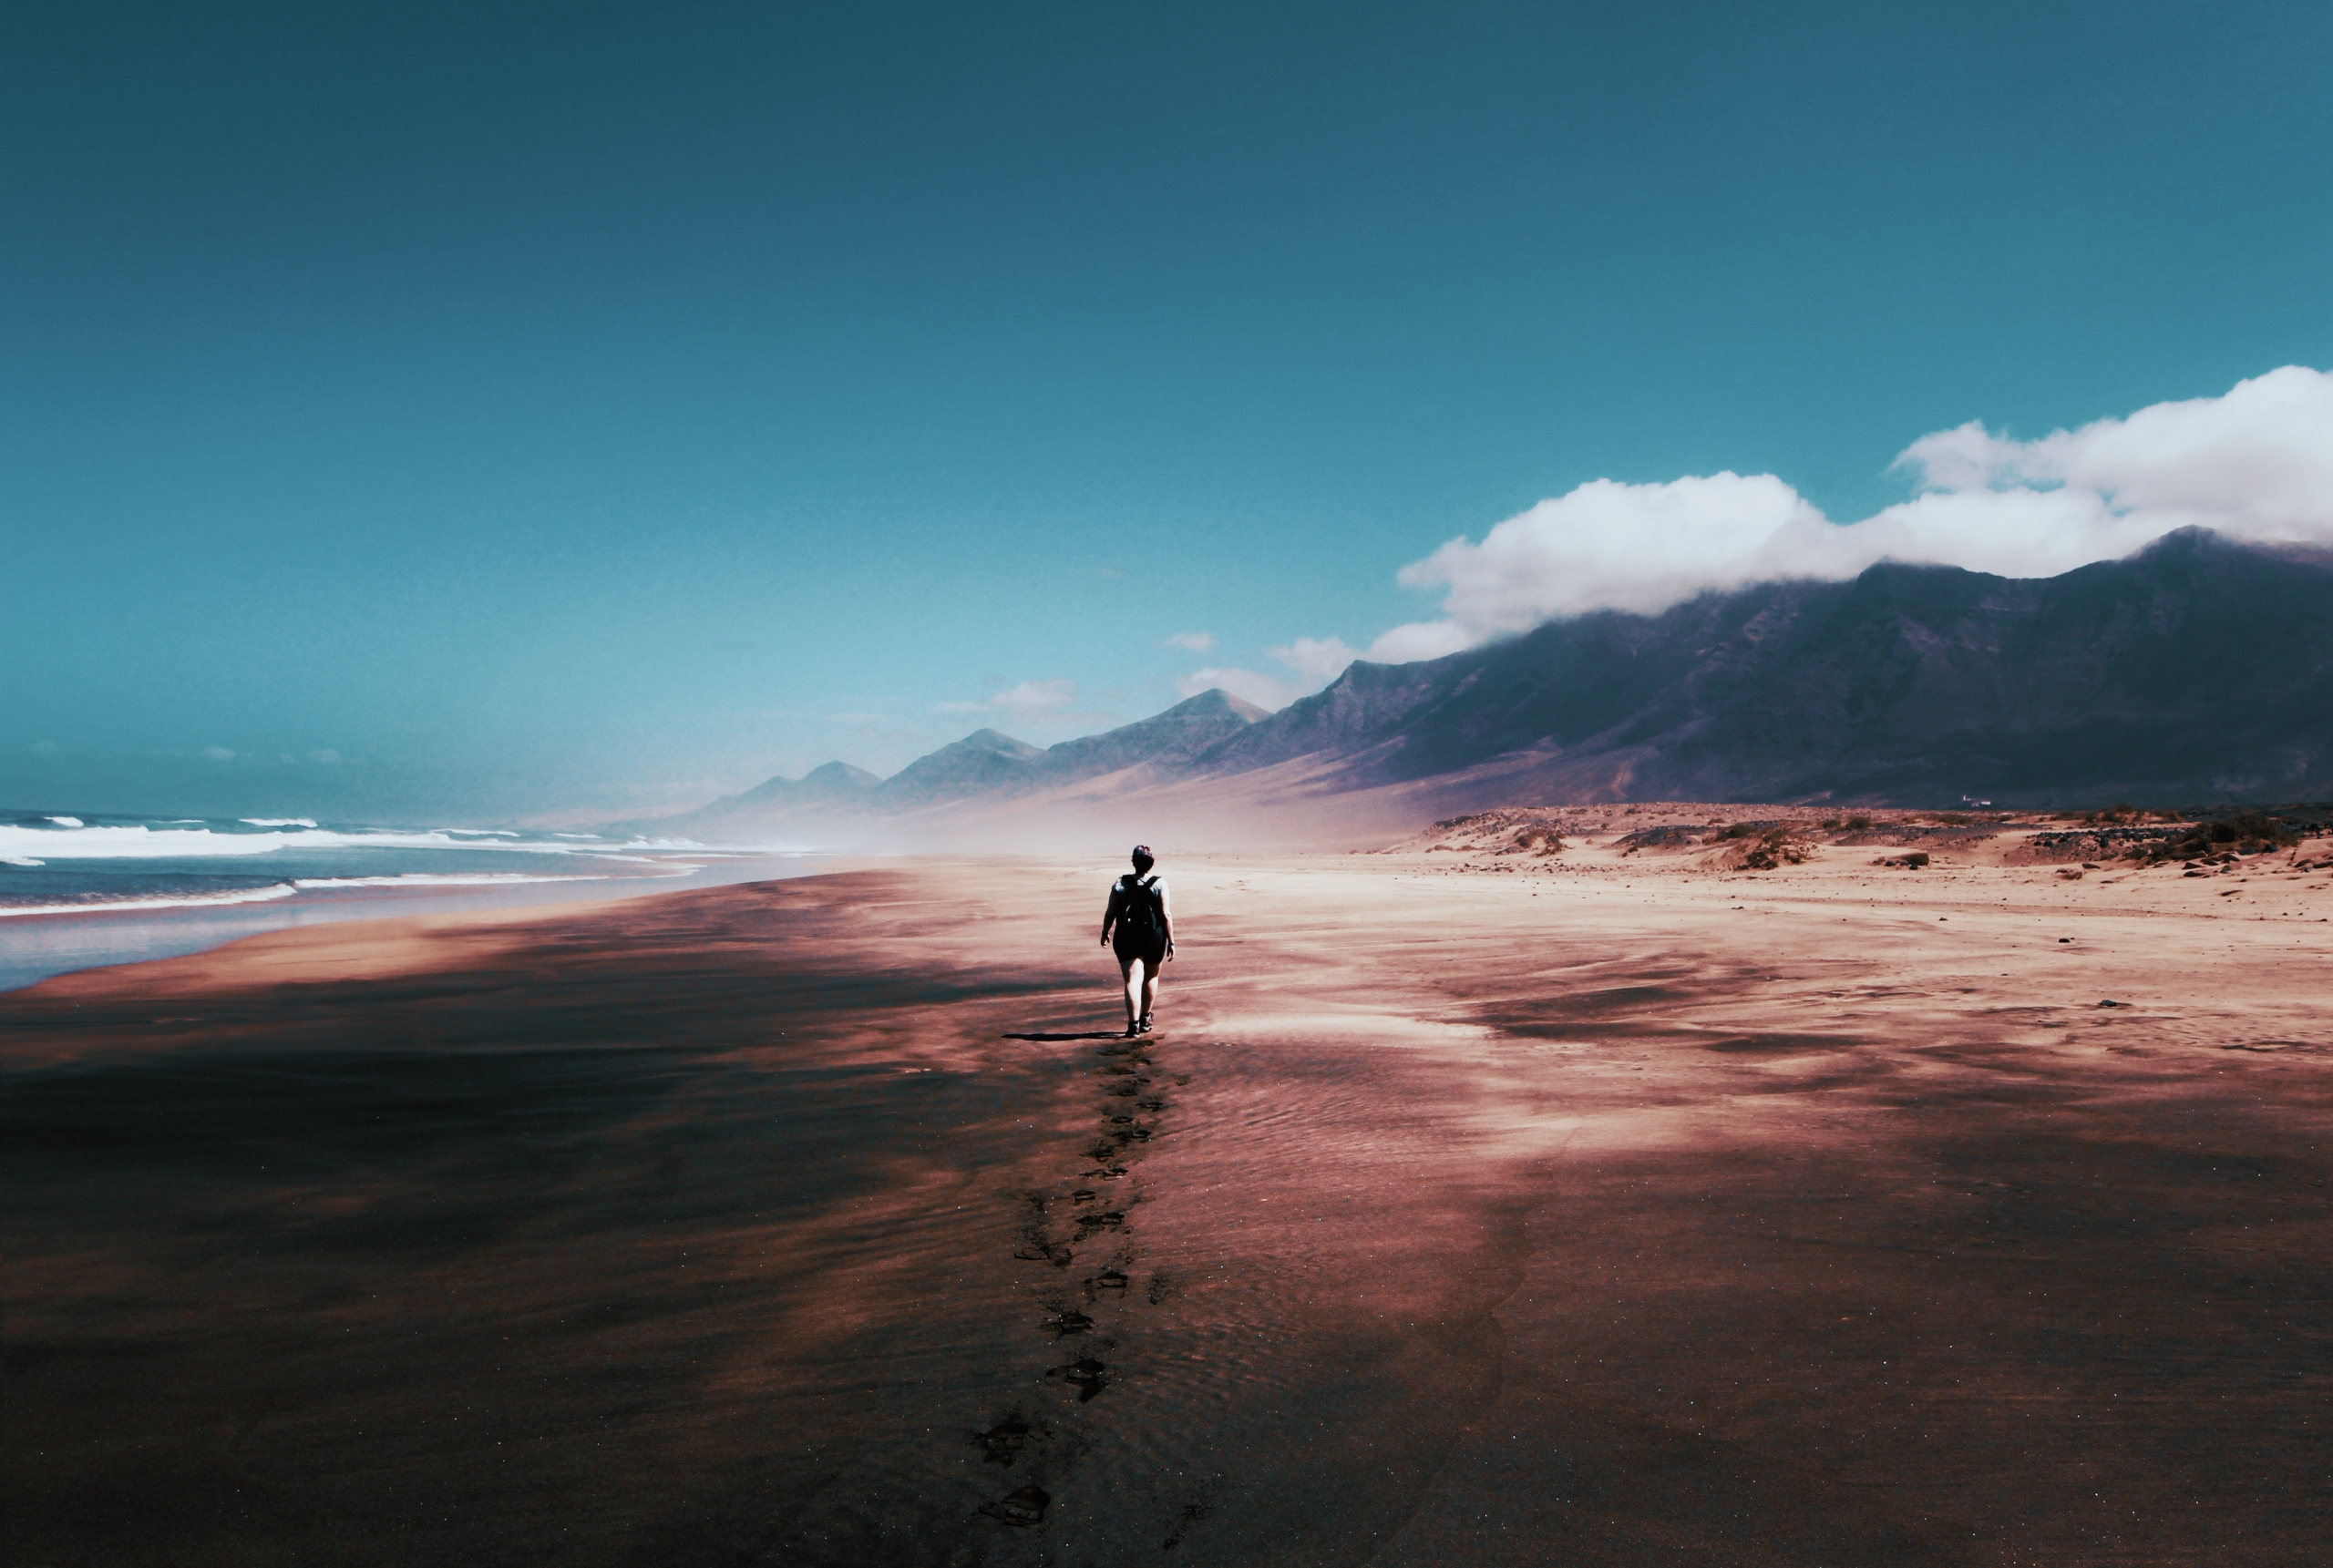 alone-beach-blue-skies-934718